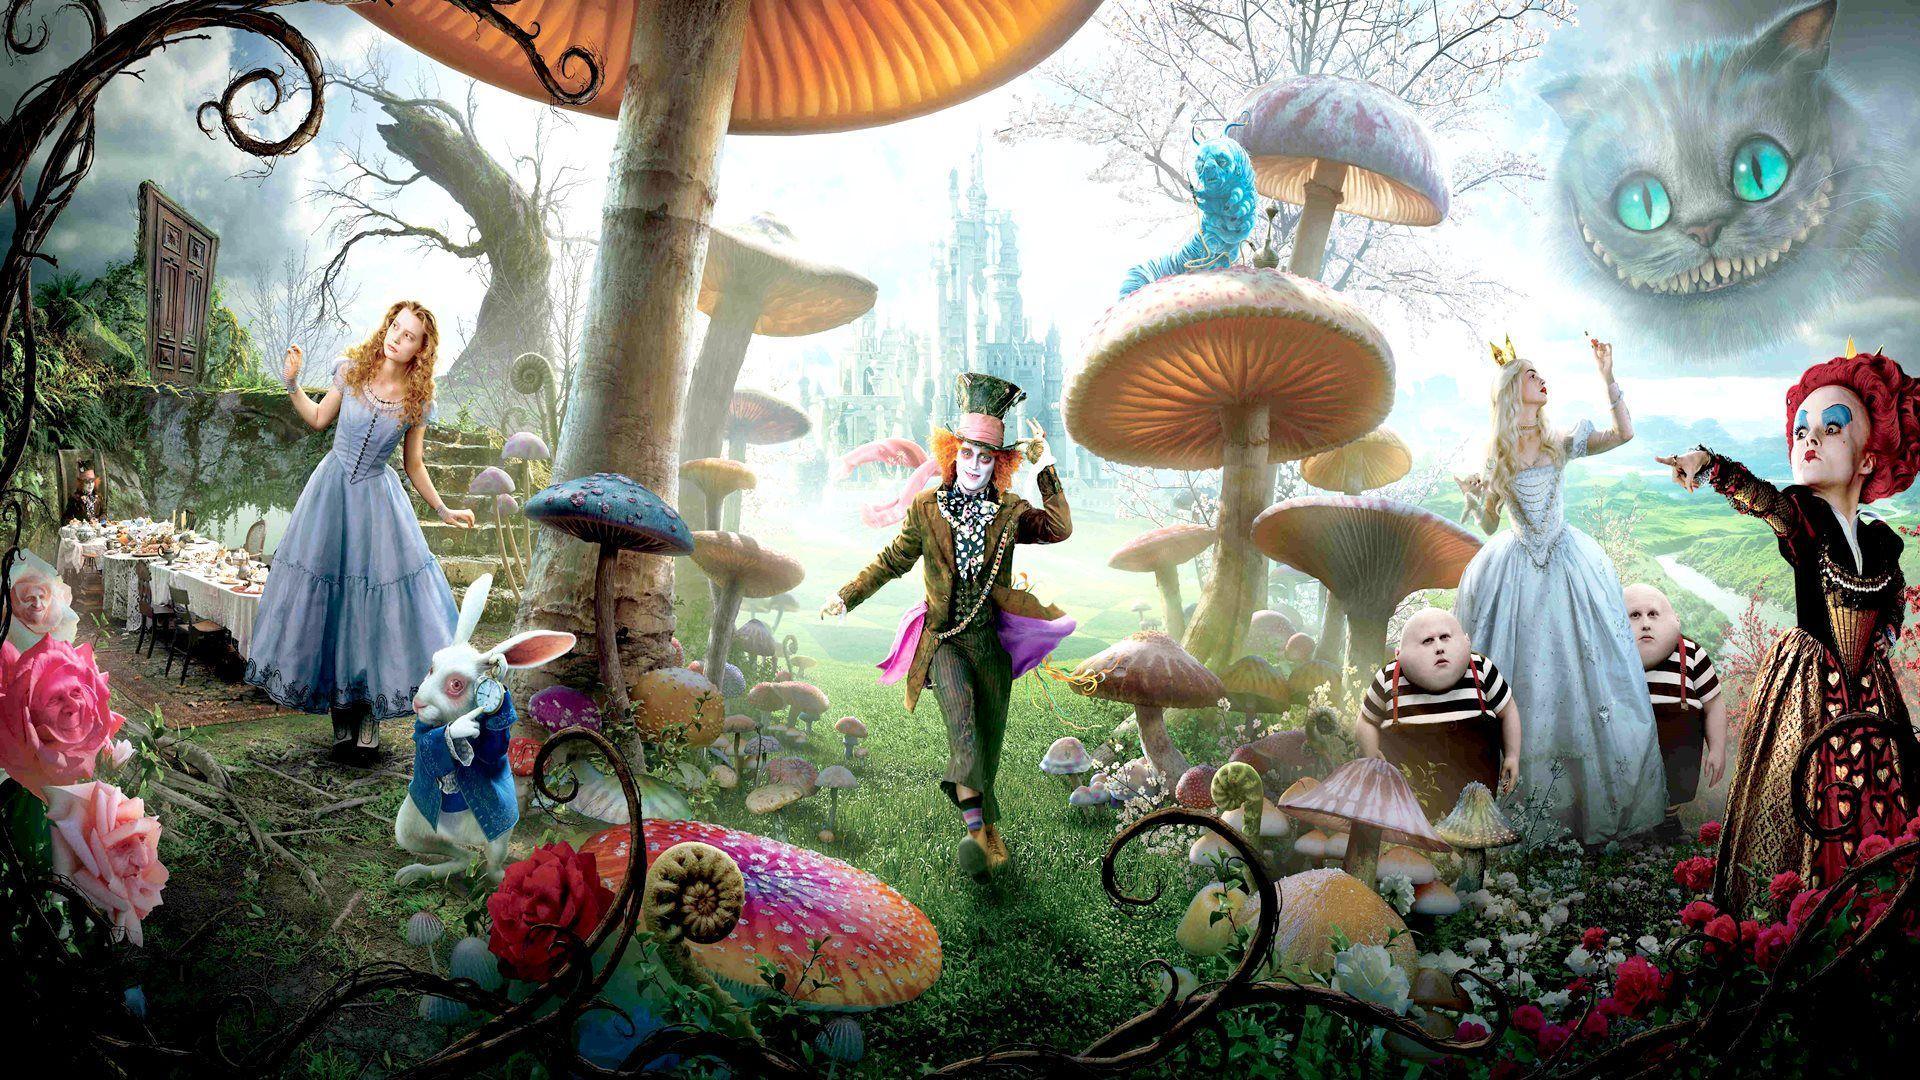 Alice In Wonderland Hd Wallpapers 1366x768 Wallpaper Cave